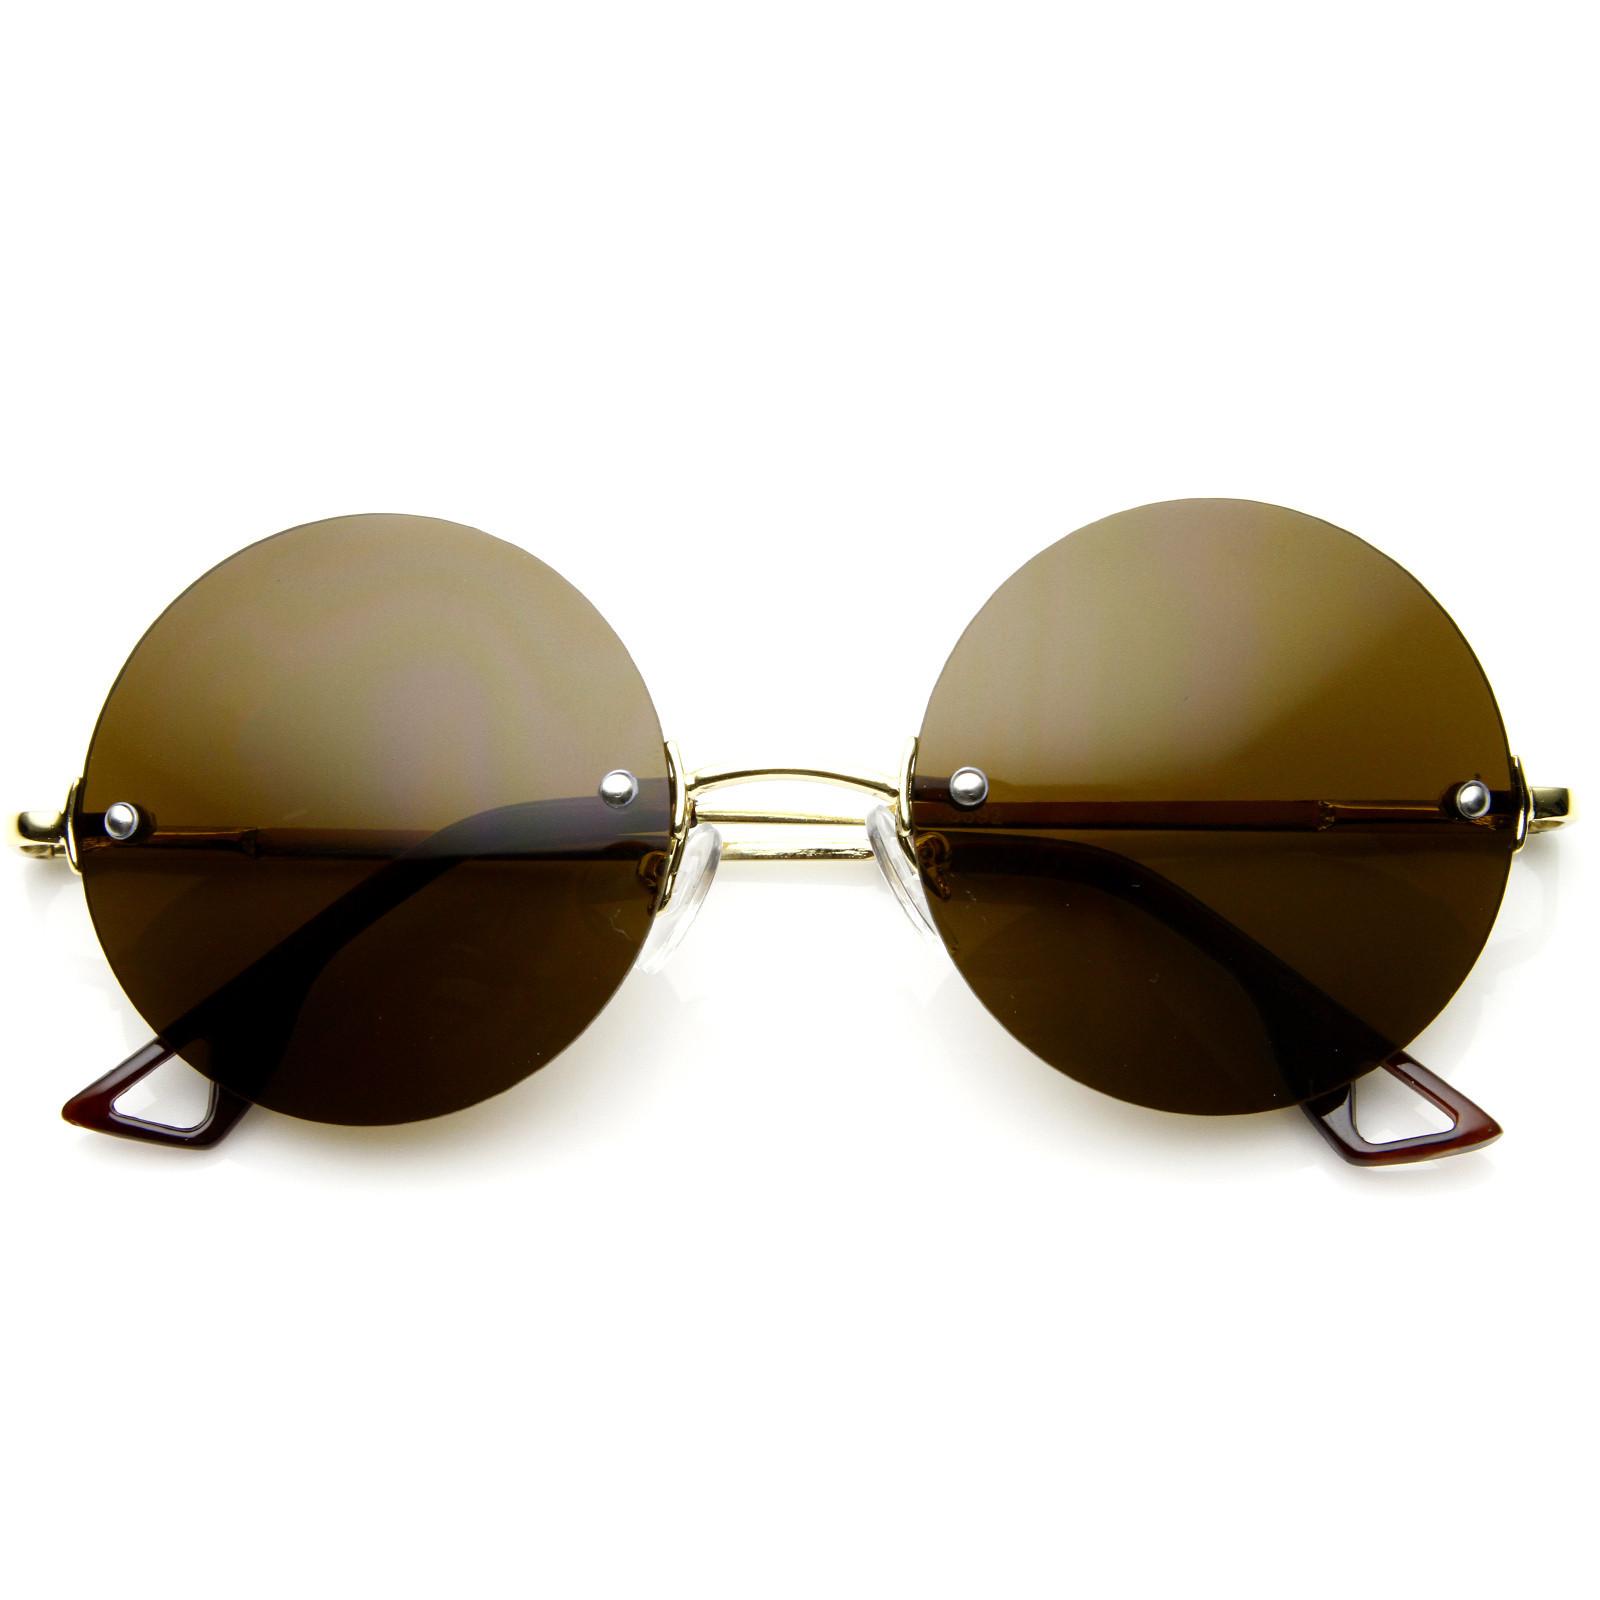 Frameless Circle Glasses : European Retro Frameless Round Fashion Sunglasses 8912